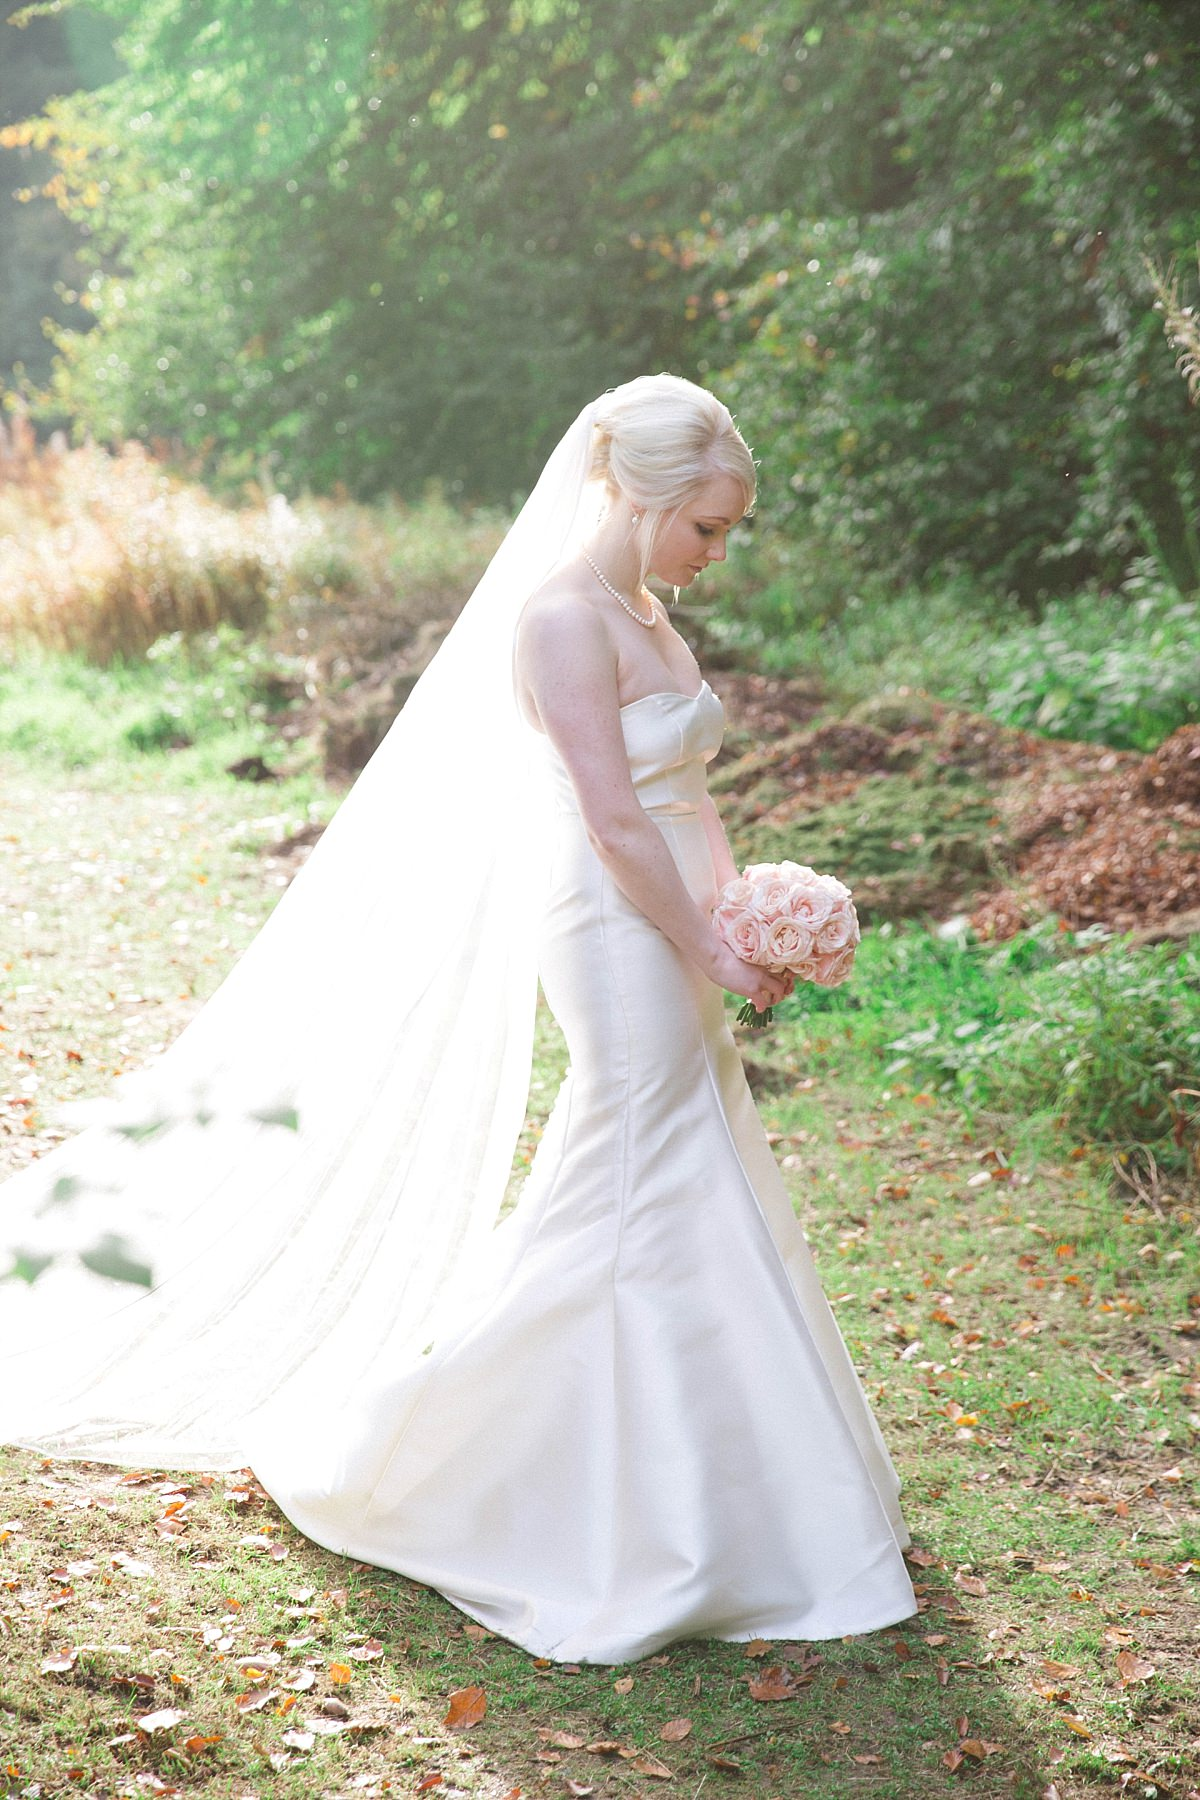 Fonab Castle wedding,The Gibsons,husband and wife photographers scotland,natural wedding photographers,natural wedding photographers Glasgow,romantic wedding photographers,two wedding photographers scotland,